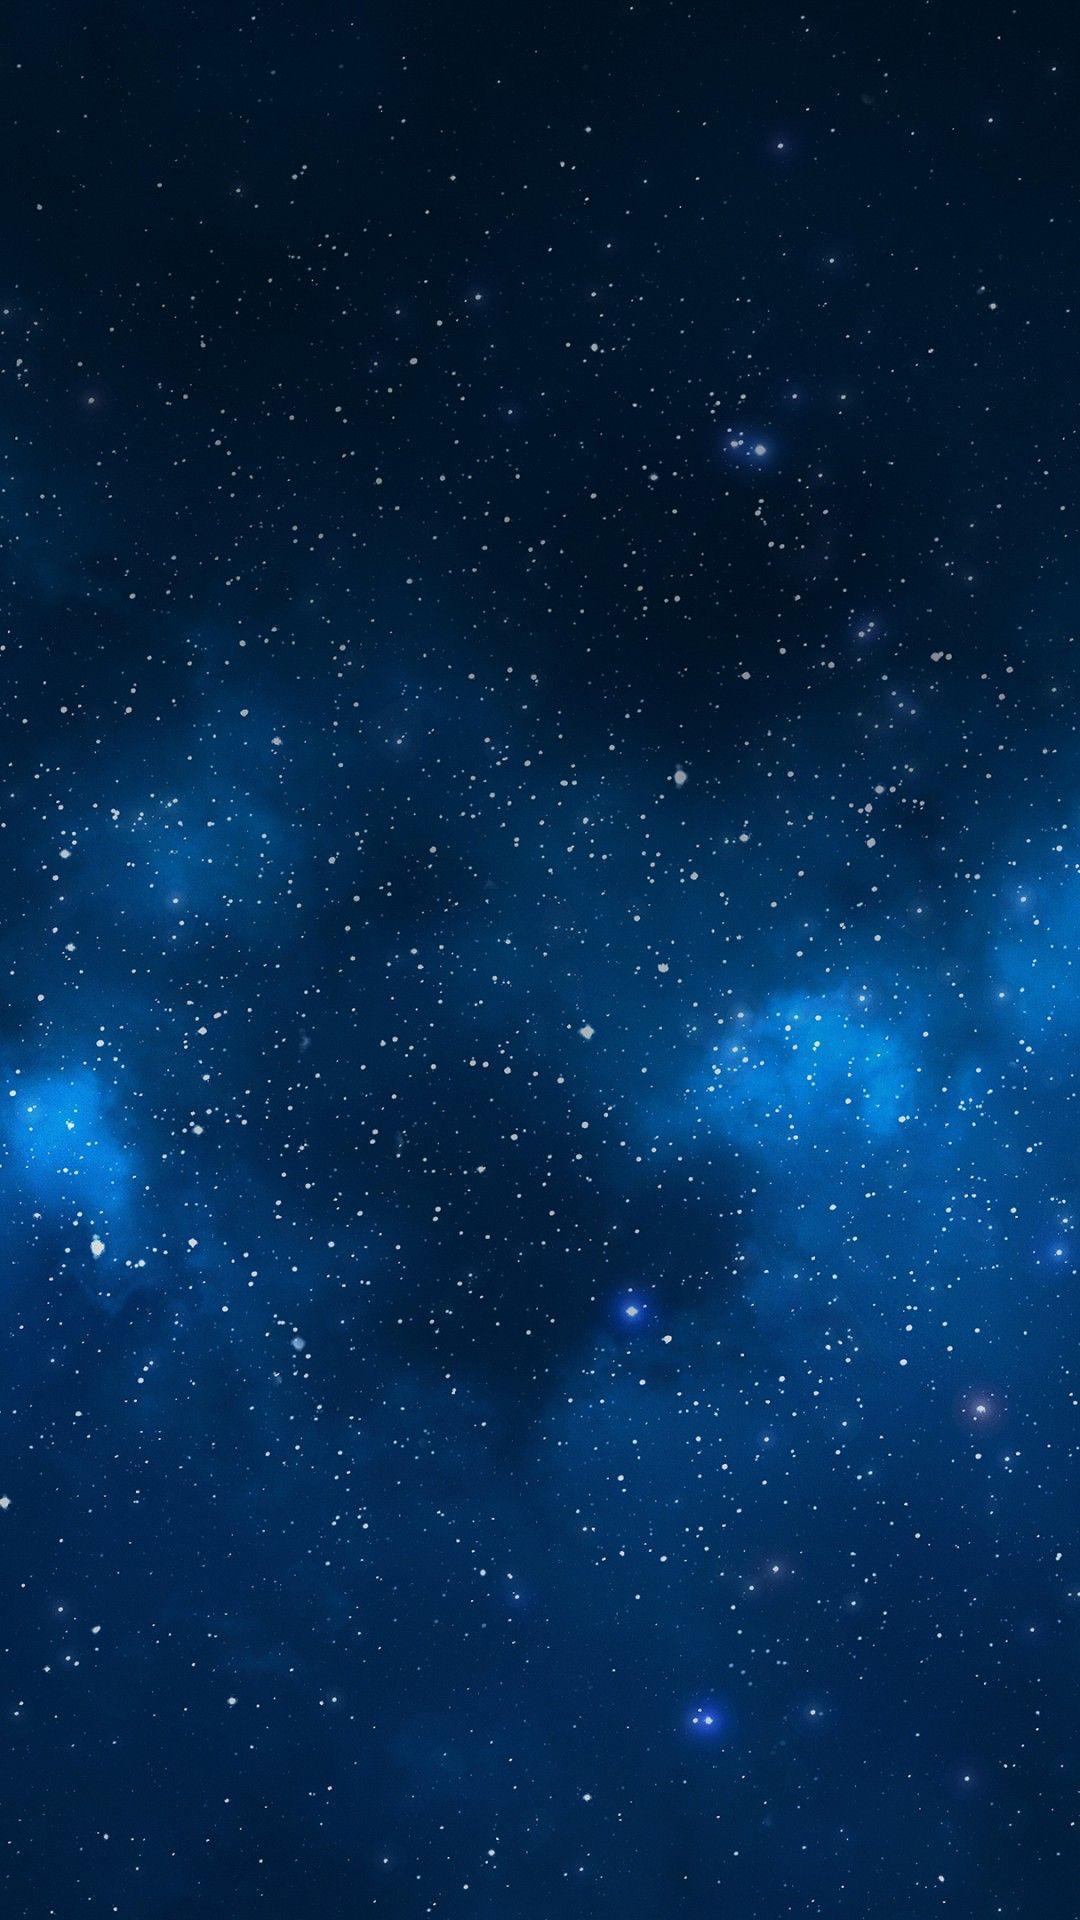 Aesthetic Dark Blue Wallpaper Home Screen > Flip